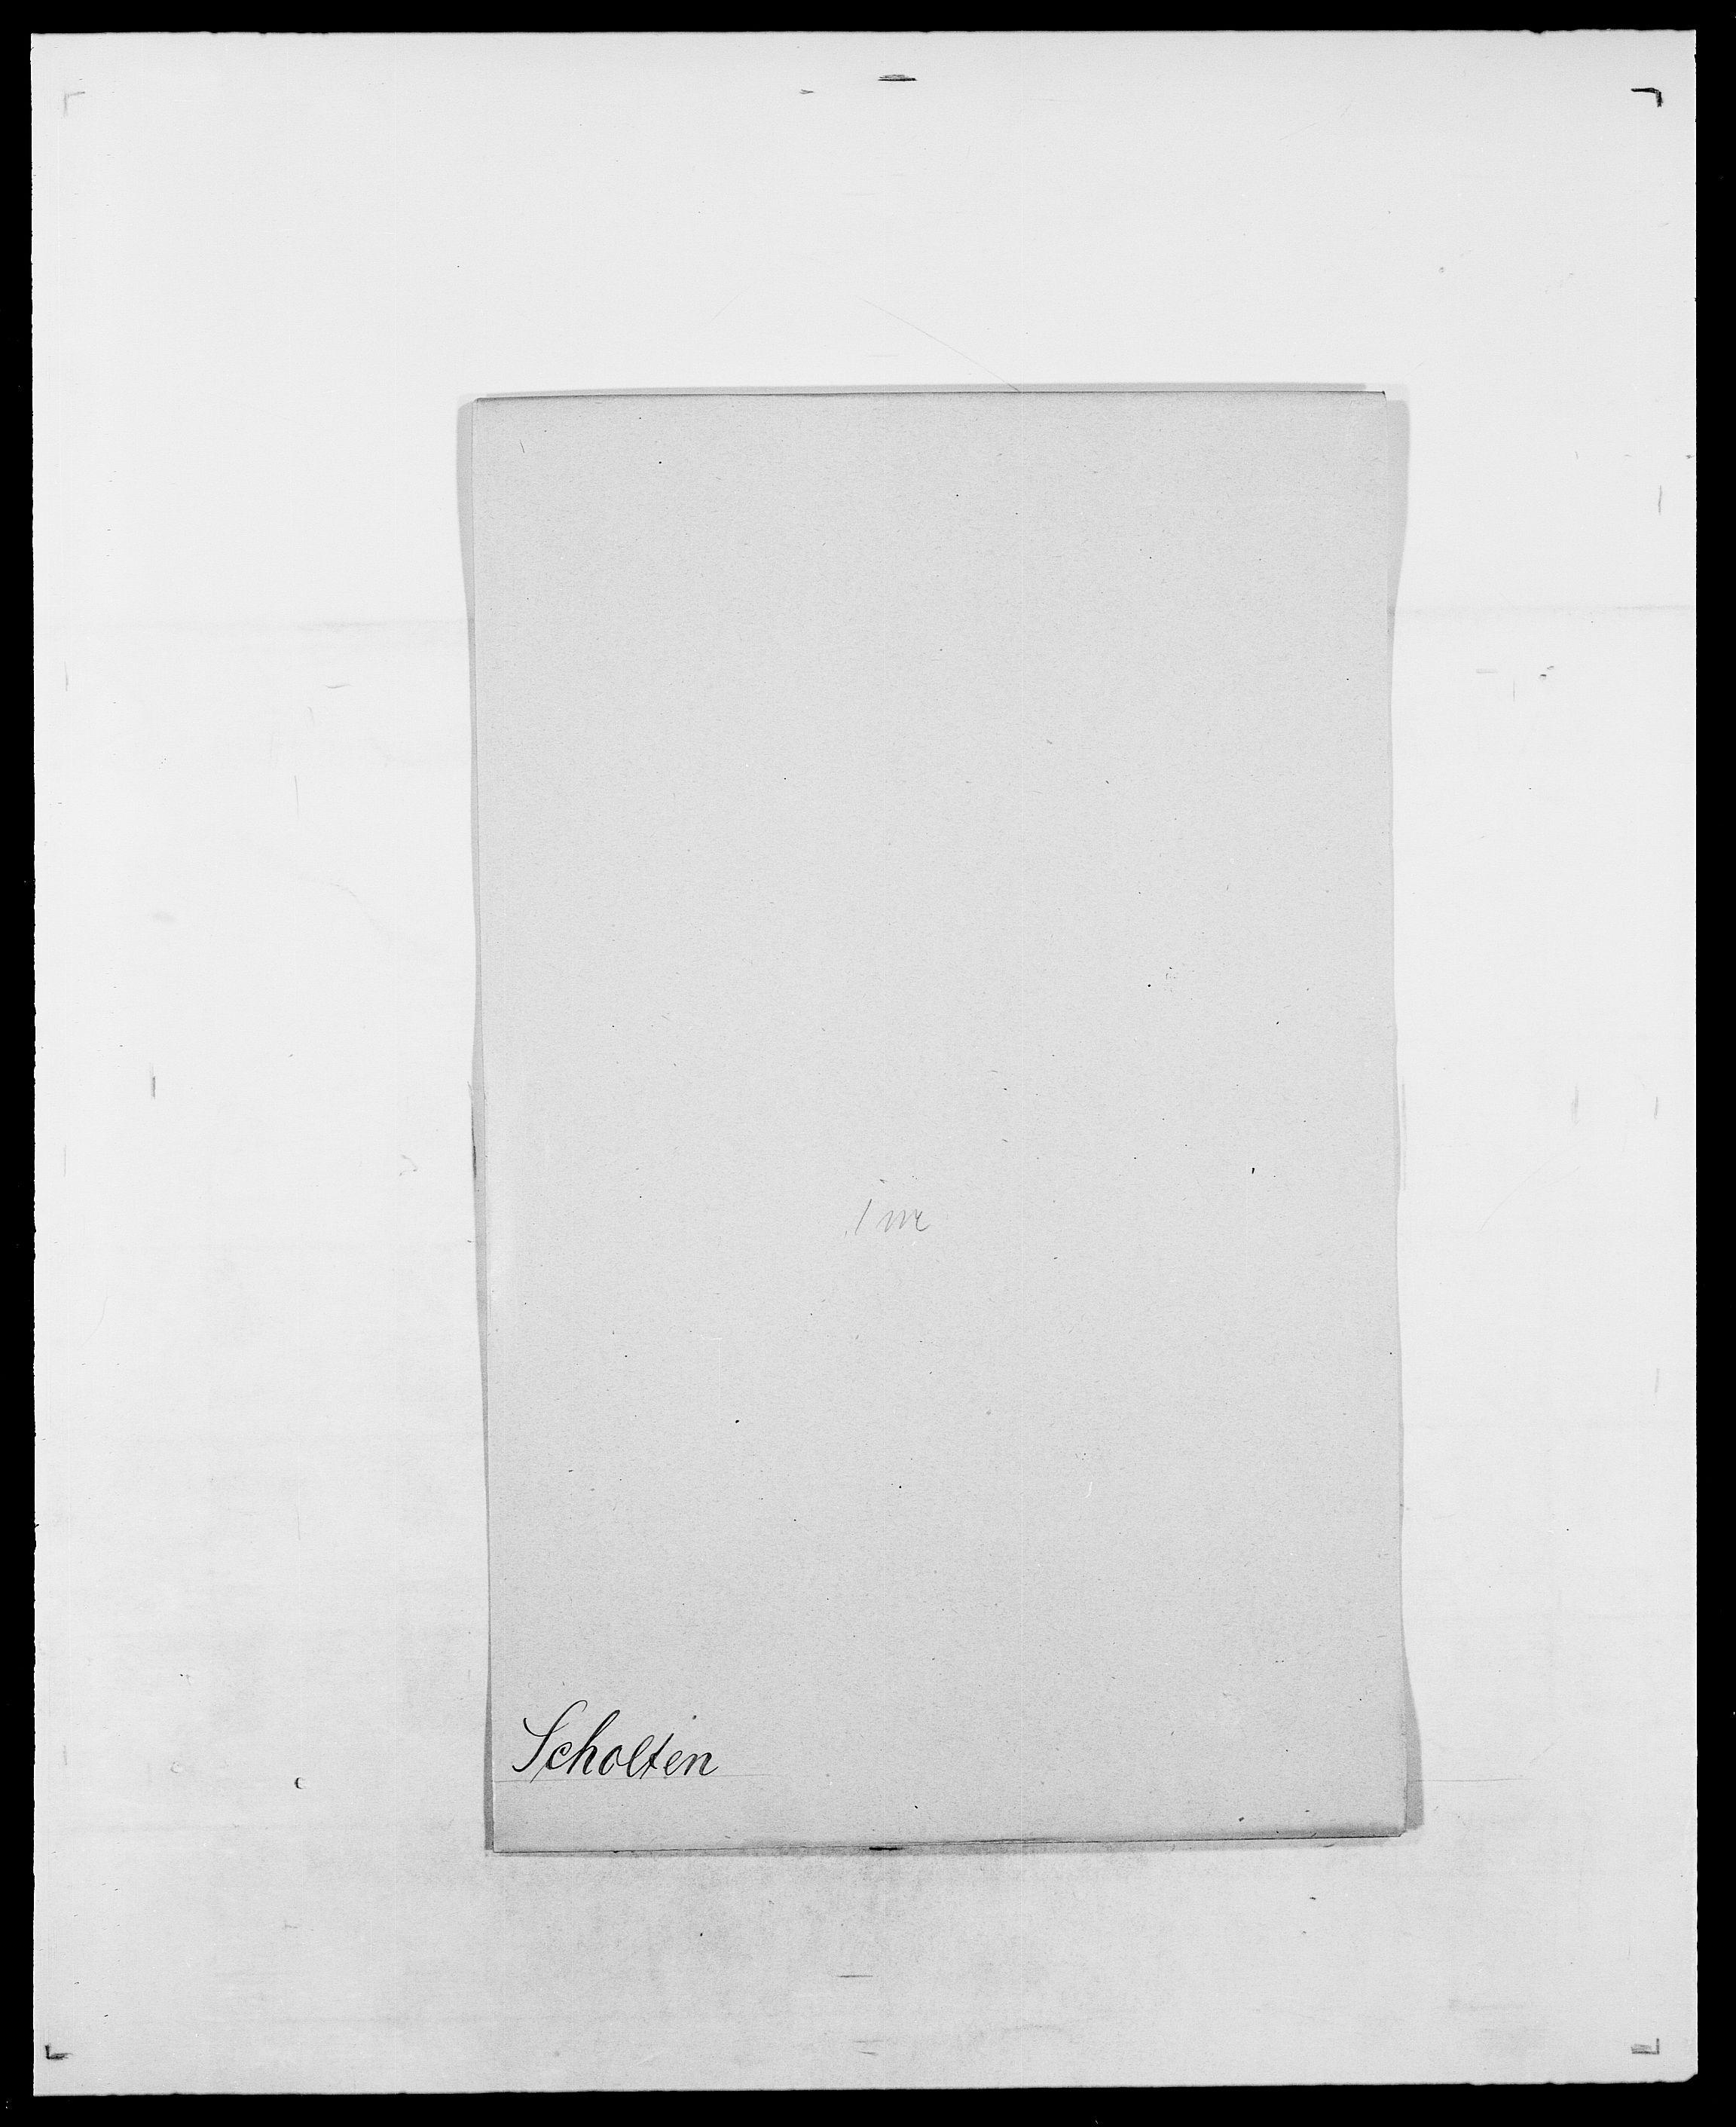 SAO, Delgobe, Charles Antoine - samling, D/Da/L0035: Schnabel - sjetman, s. 72